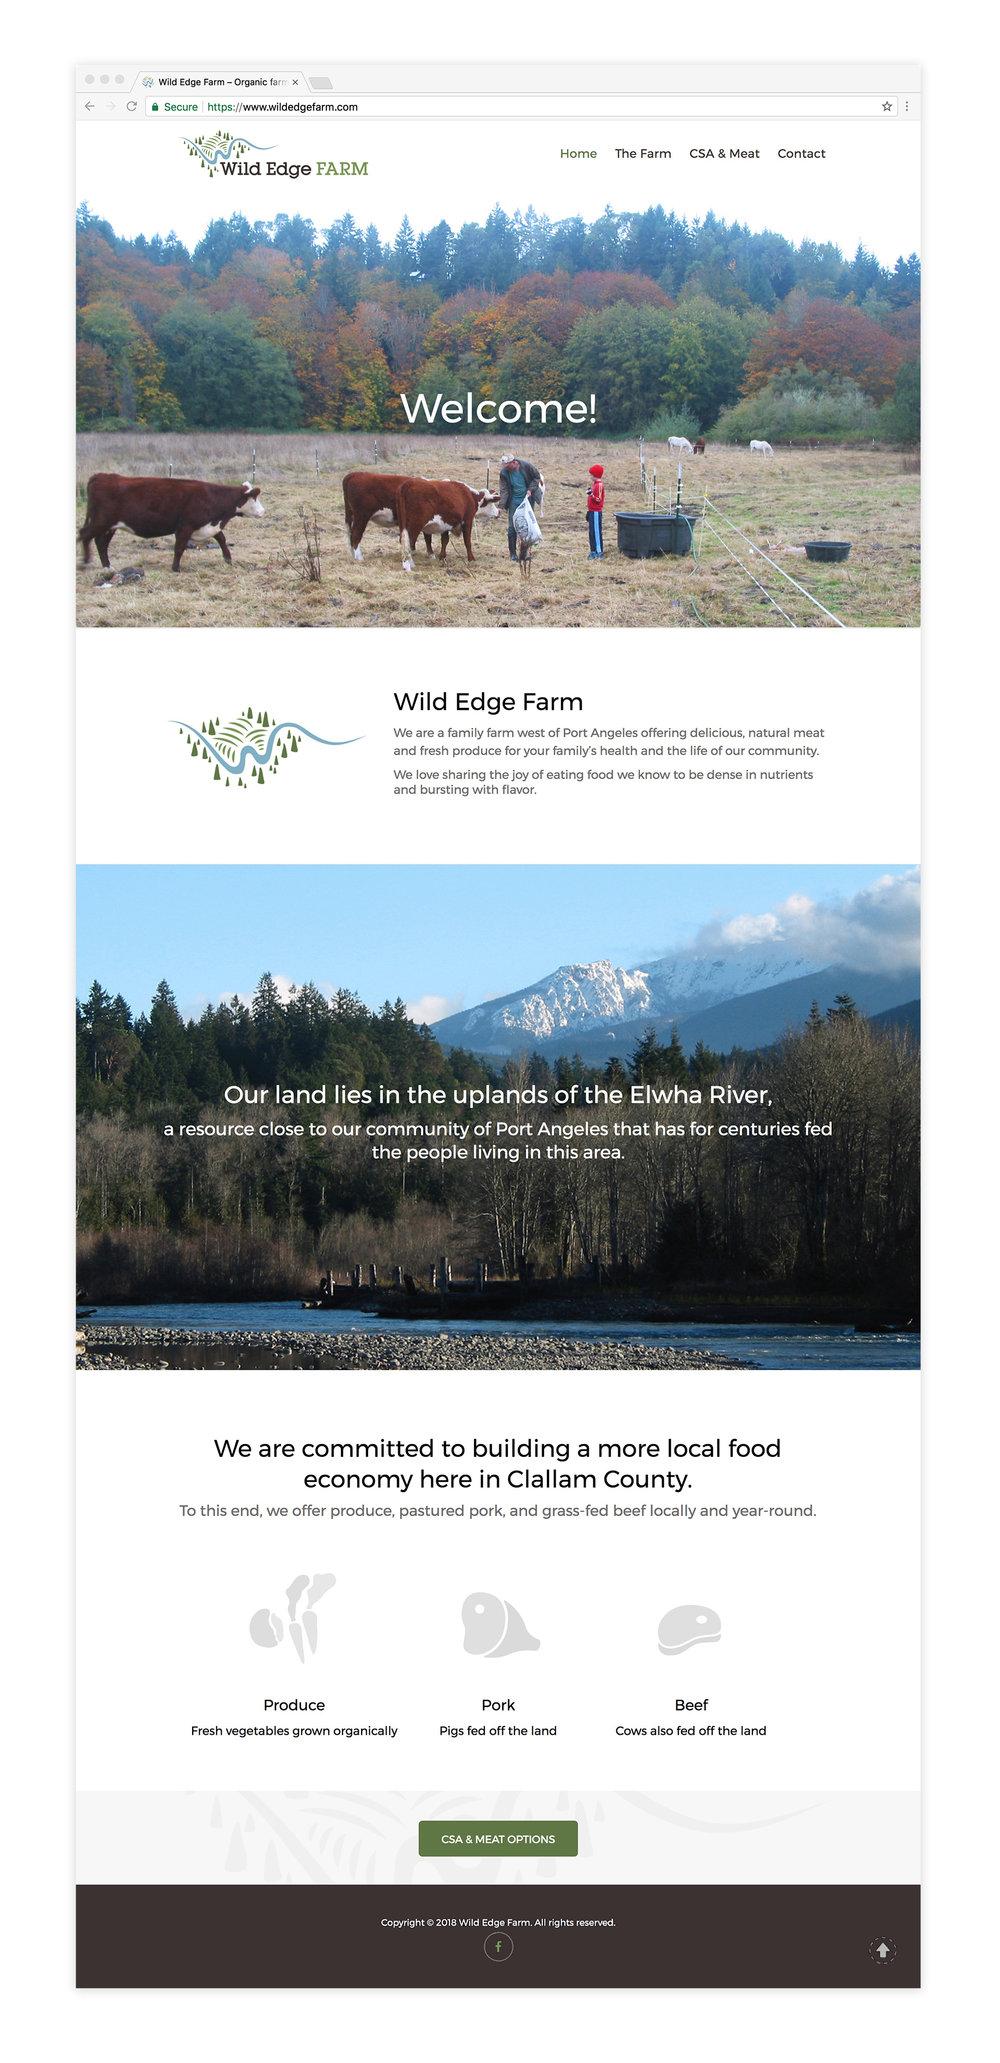 WildEdgeFarm_home_full page2.jpg